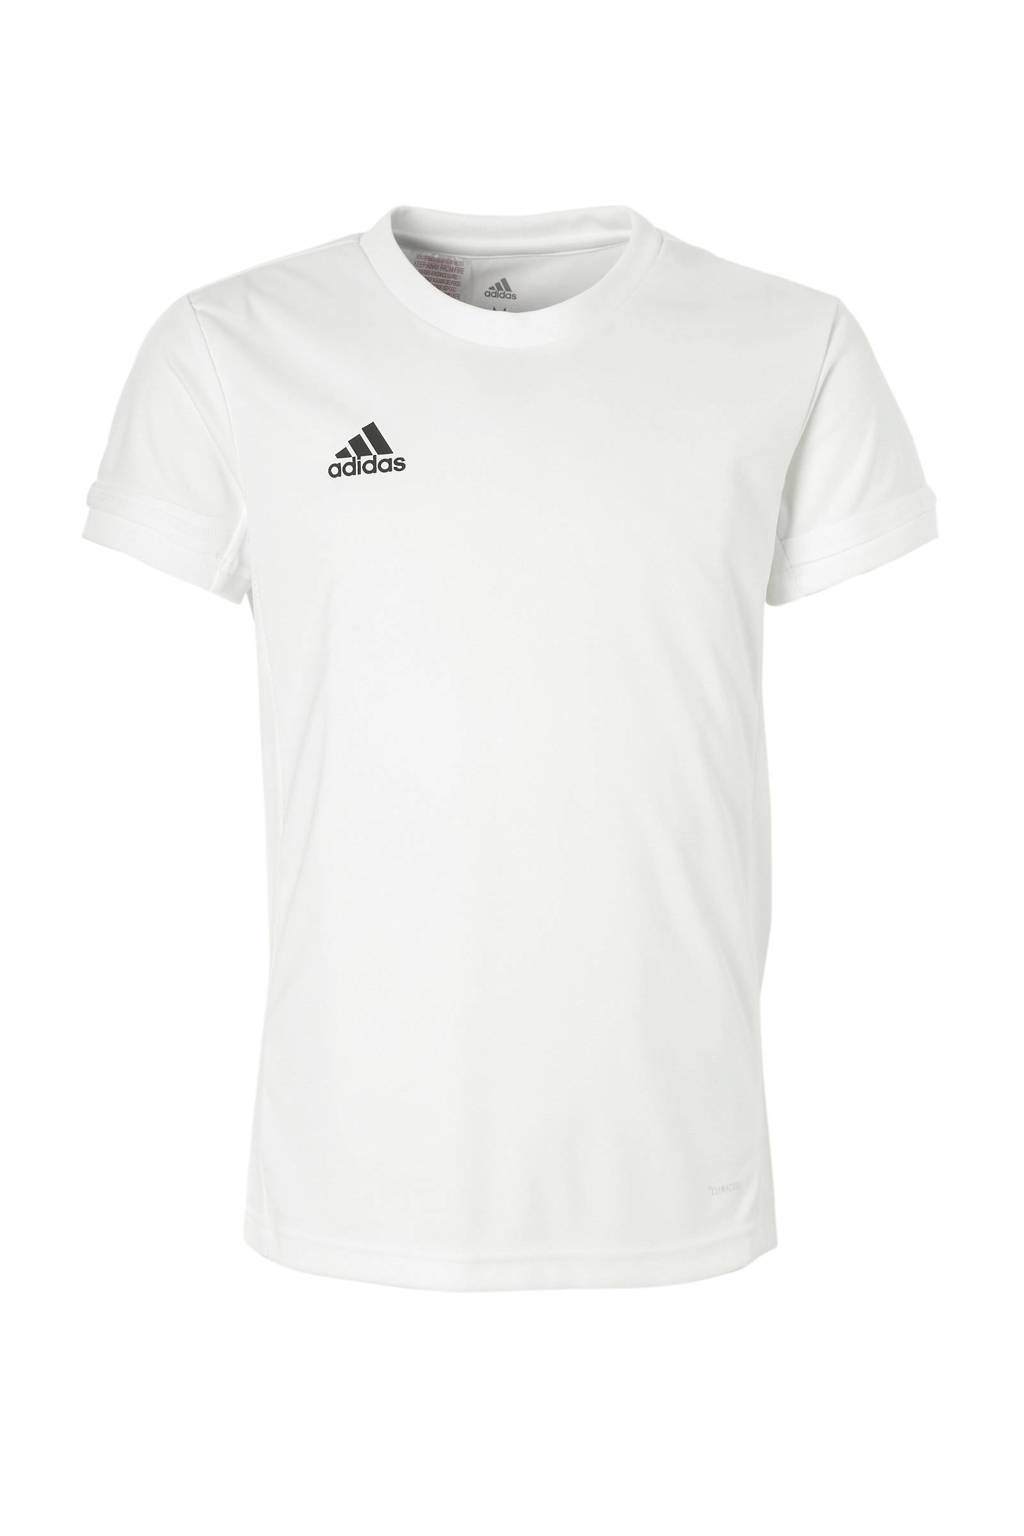 adidas performance sport T-shirt T19 wit, Tennis